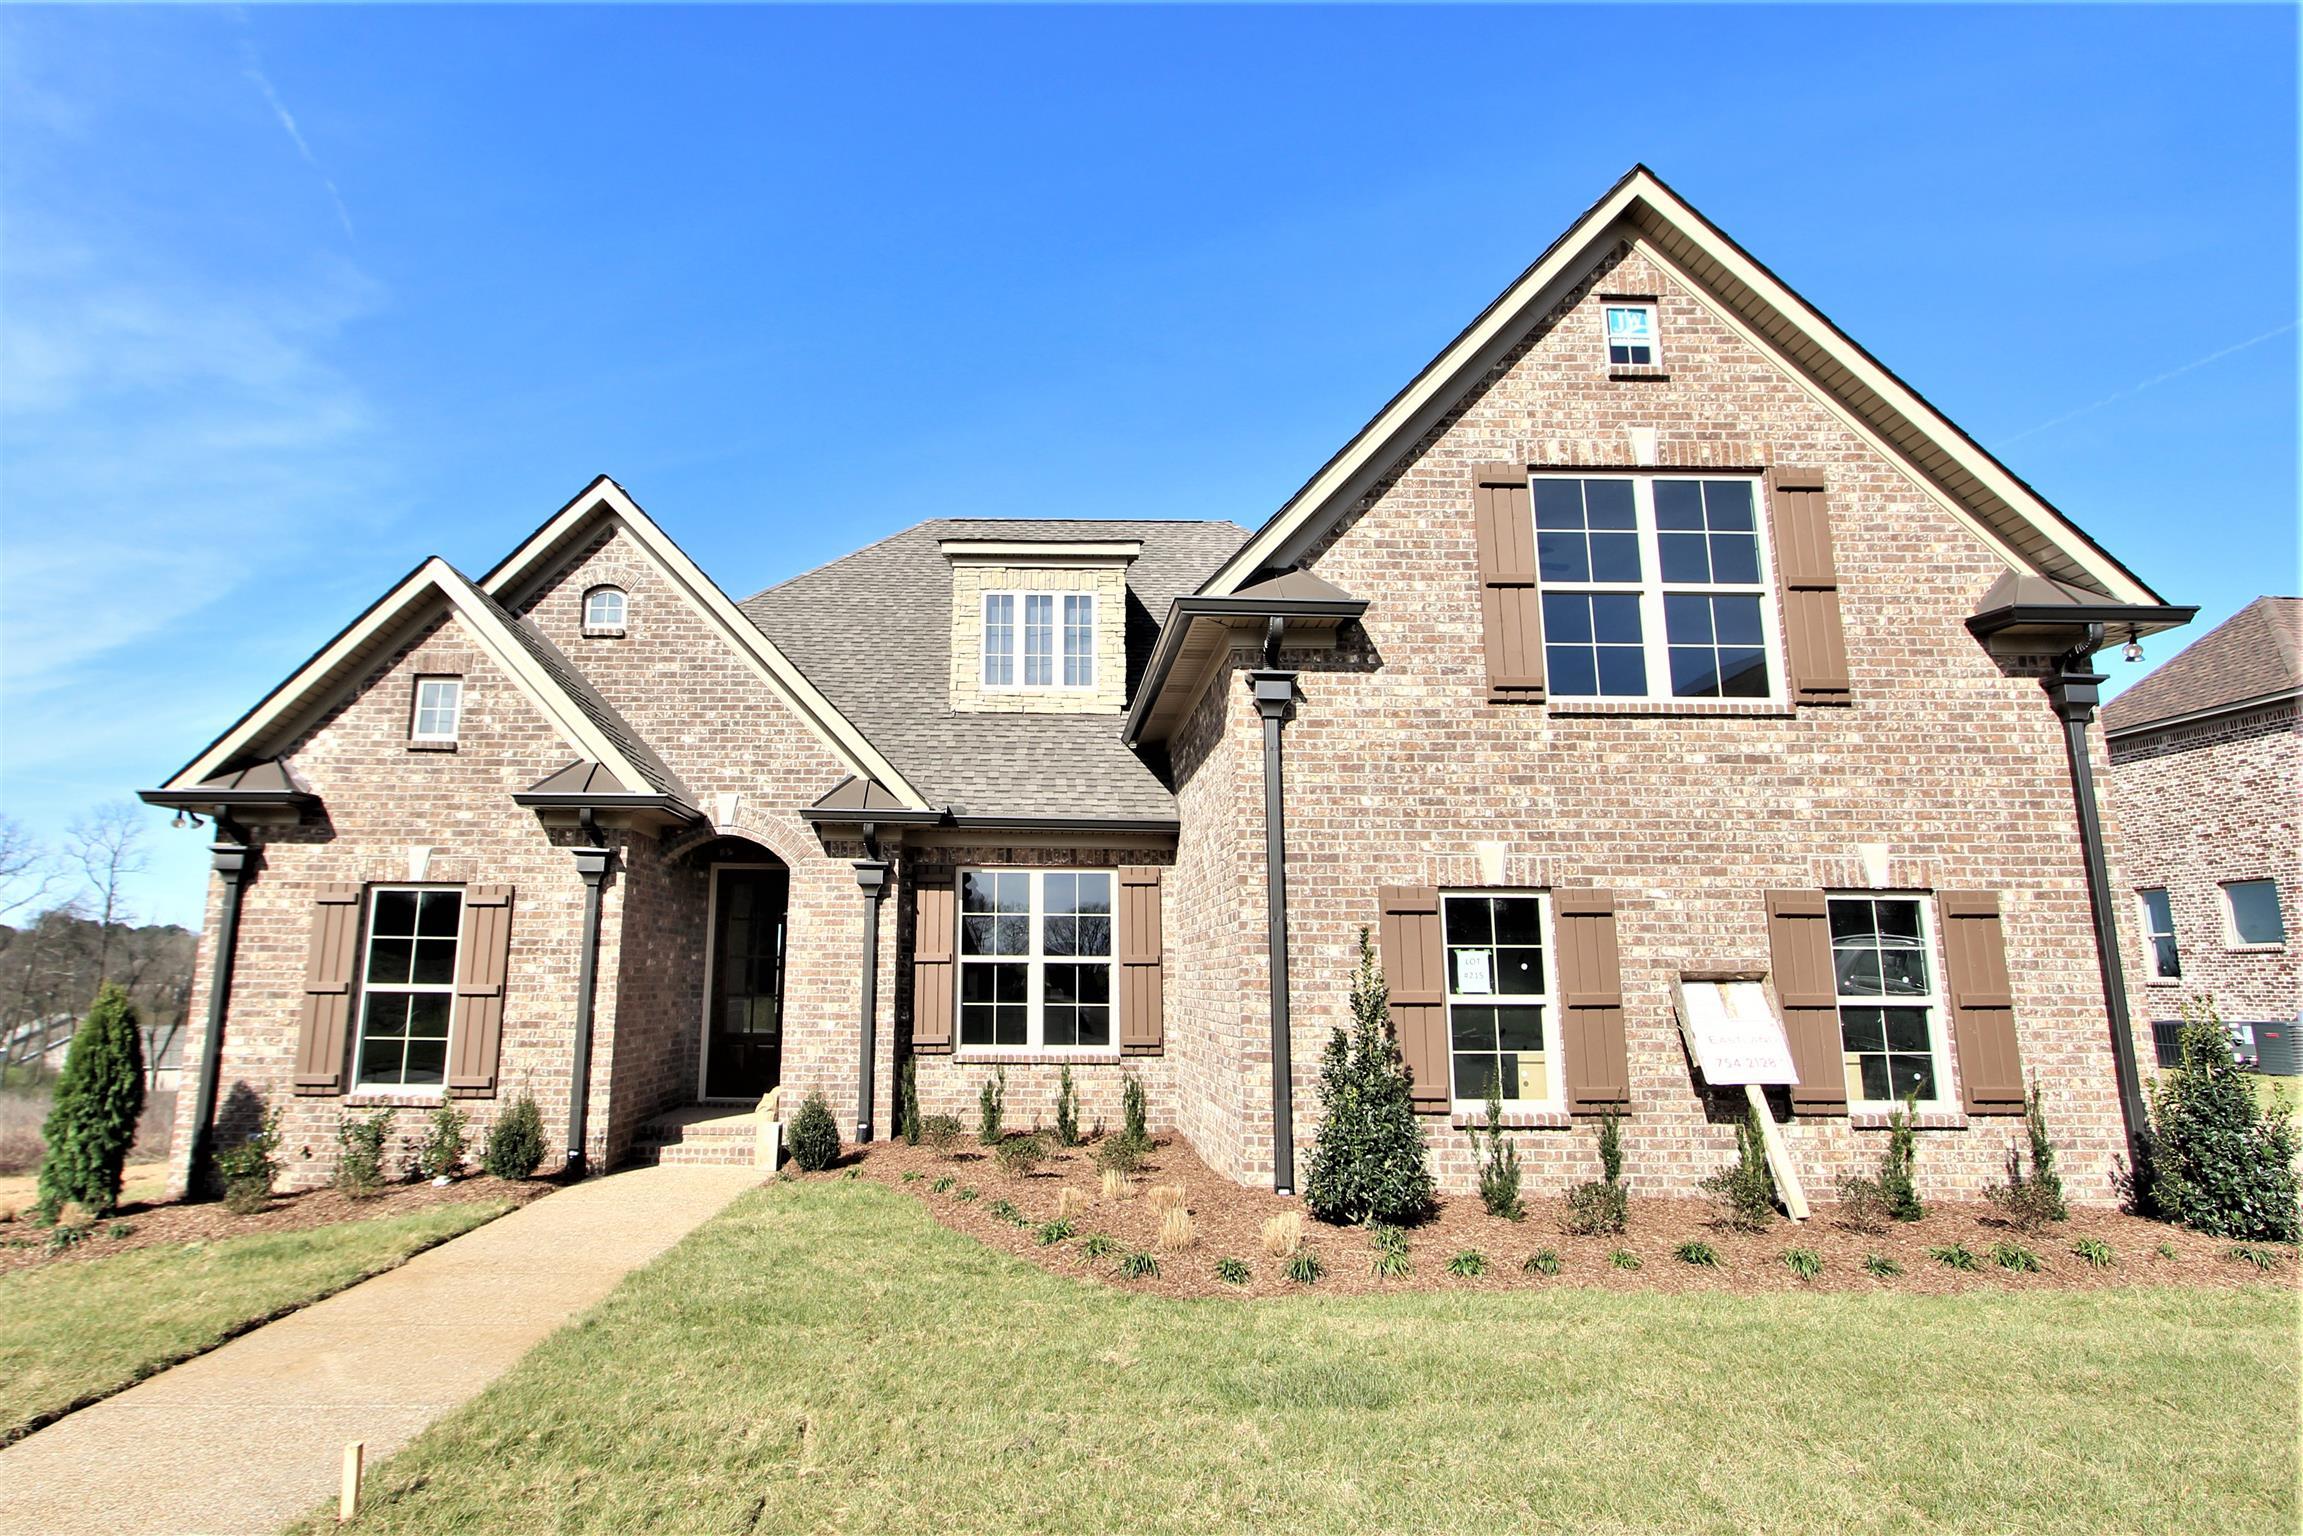 436 Whitley Way #215, Mount Juliet, TN 37122 - Mount Juliet, TN real estate listing